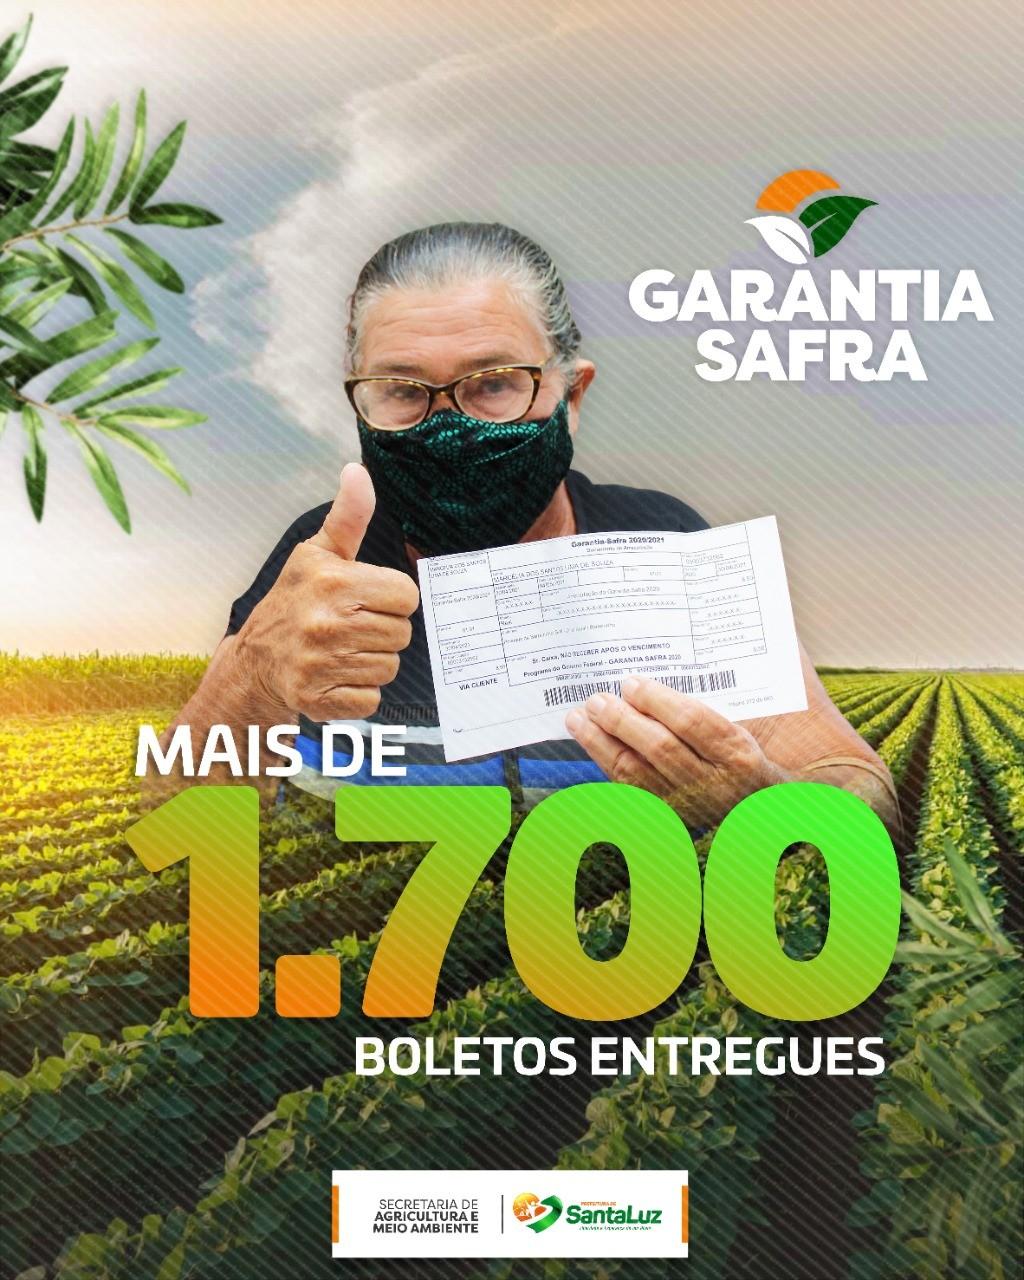 Secretaria entrega mais de 1.700 boletos do Garantia Safra